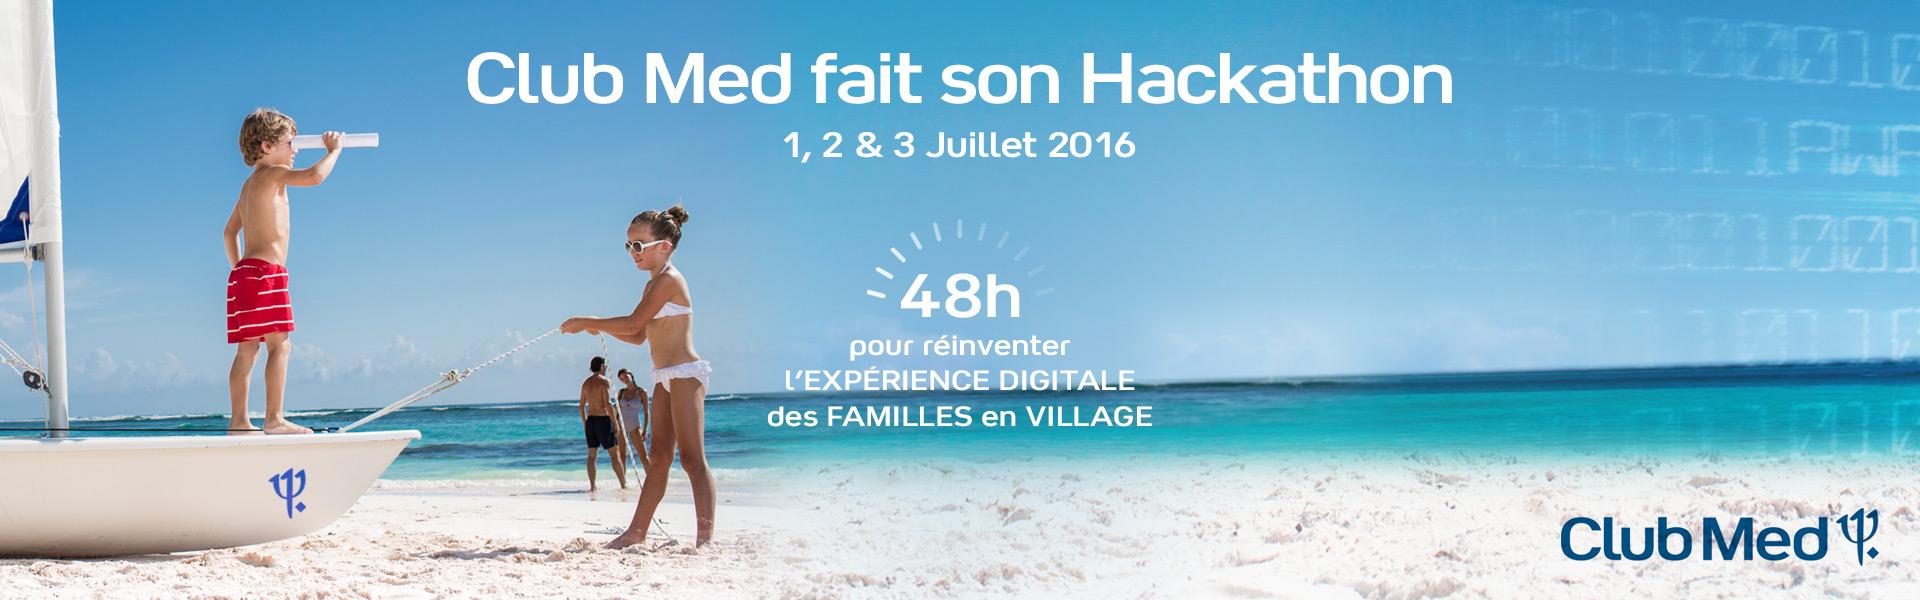 Visuel Club Med fait son Hackathon